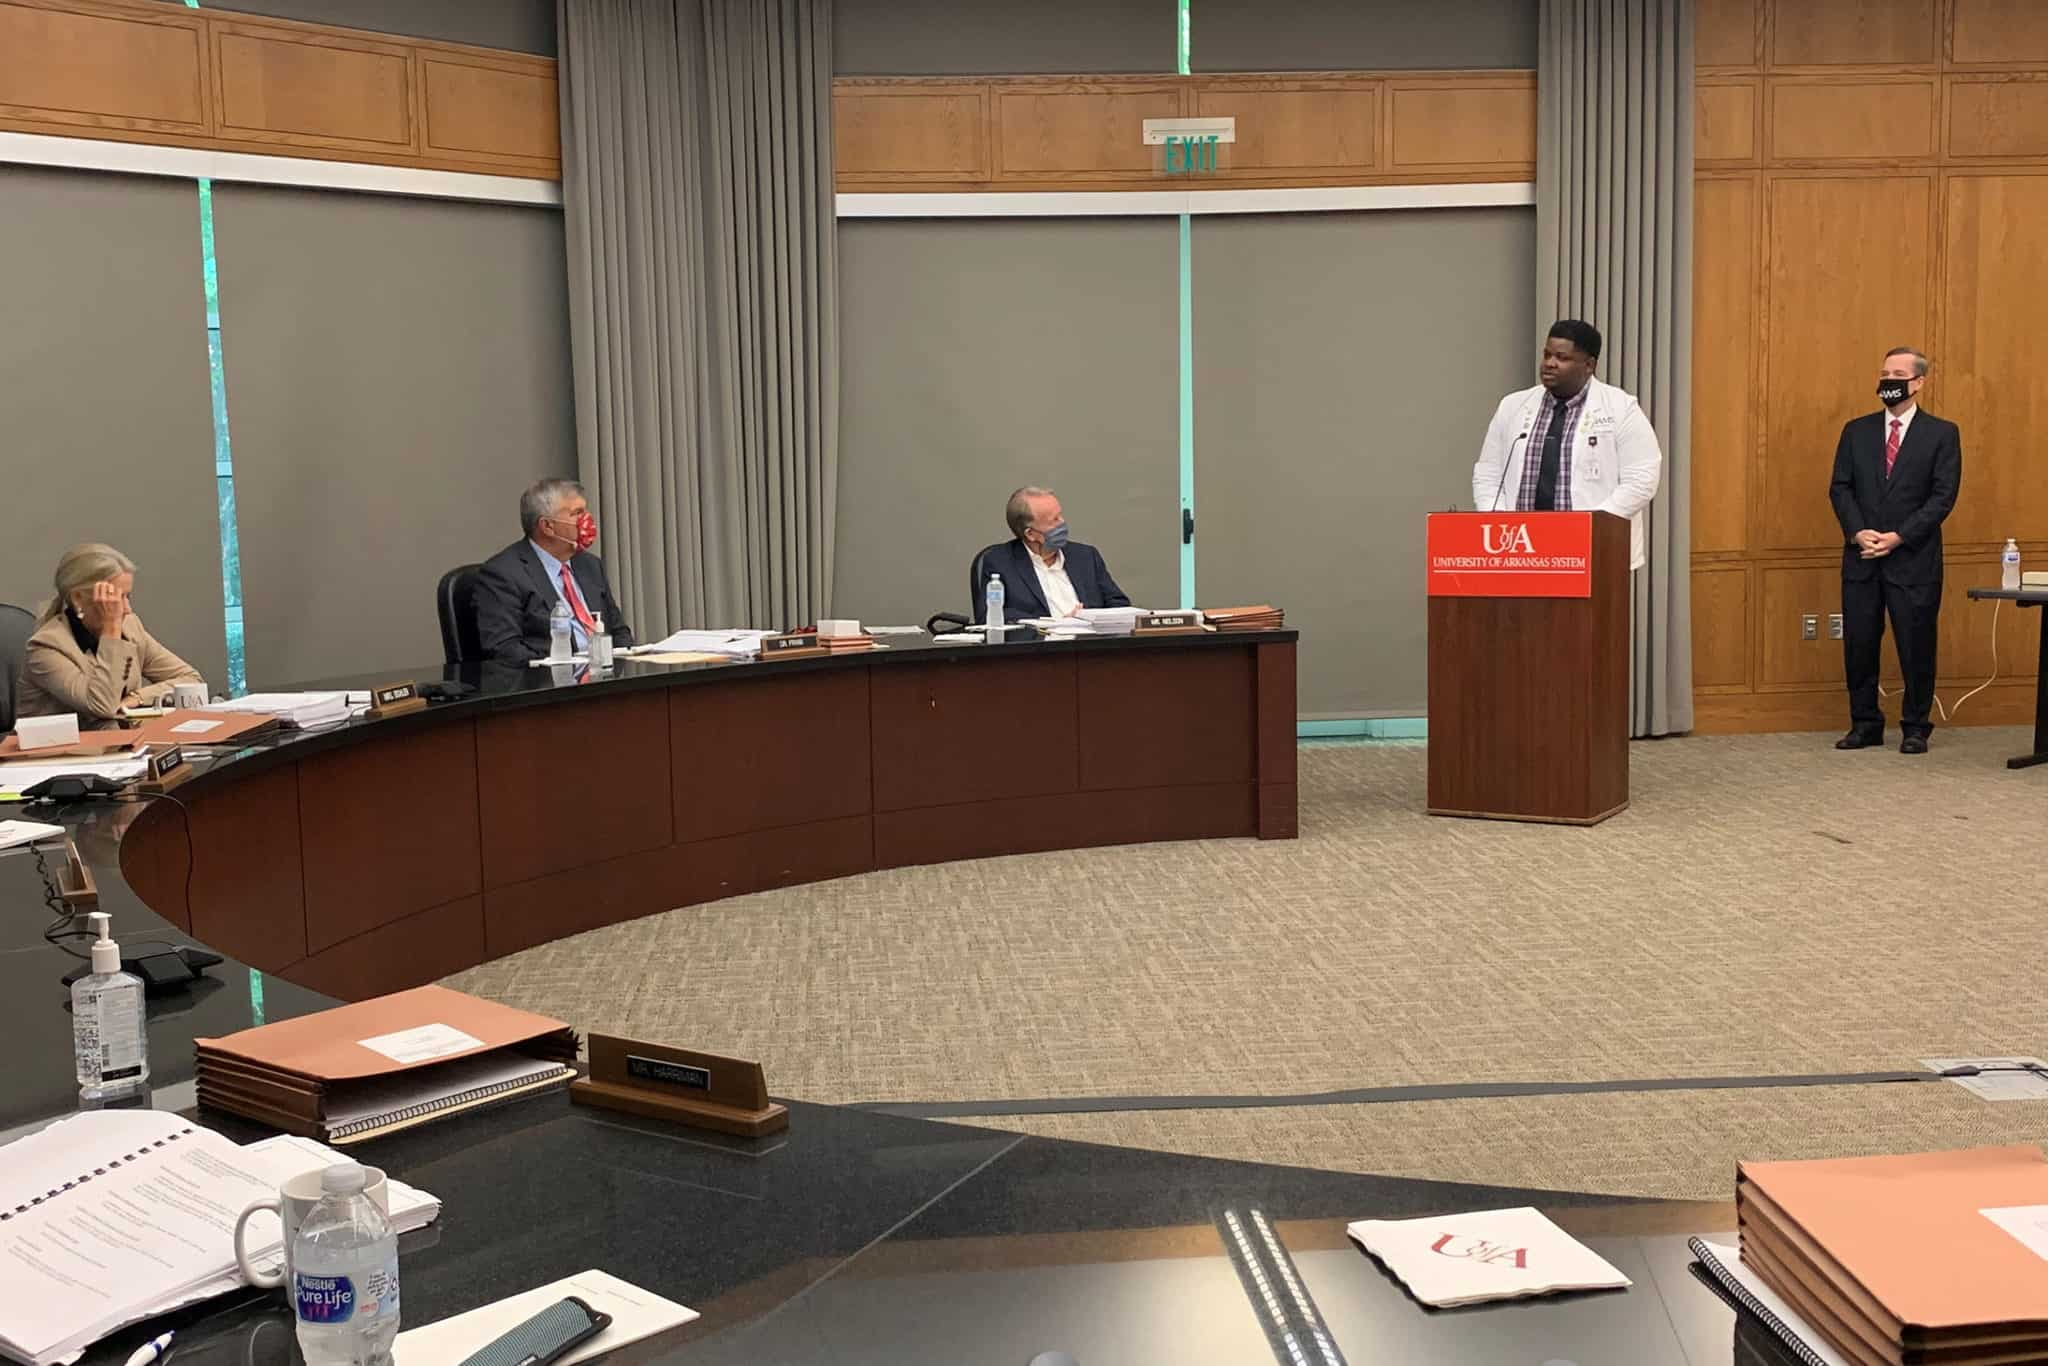 Byron Johnson at the podium